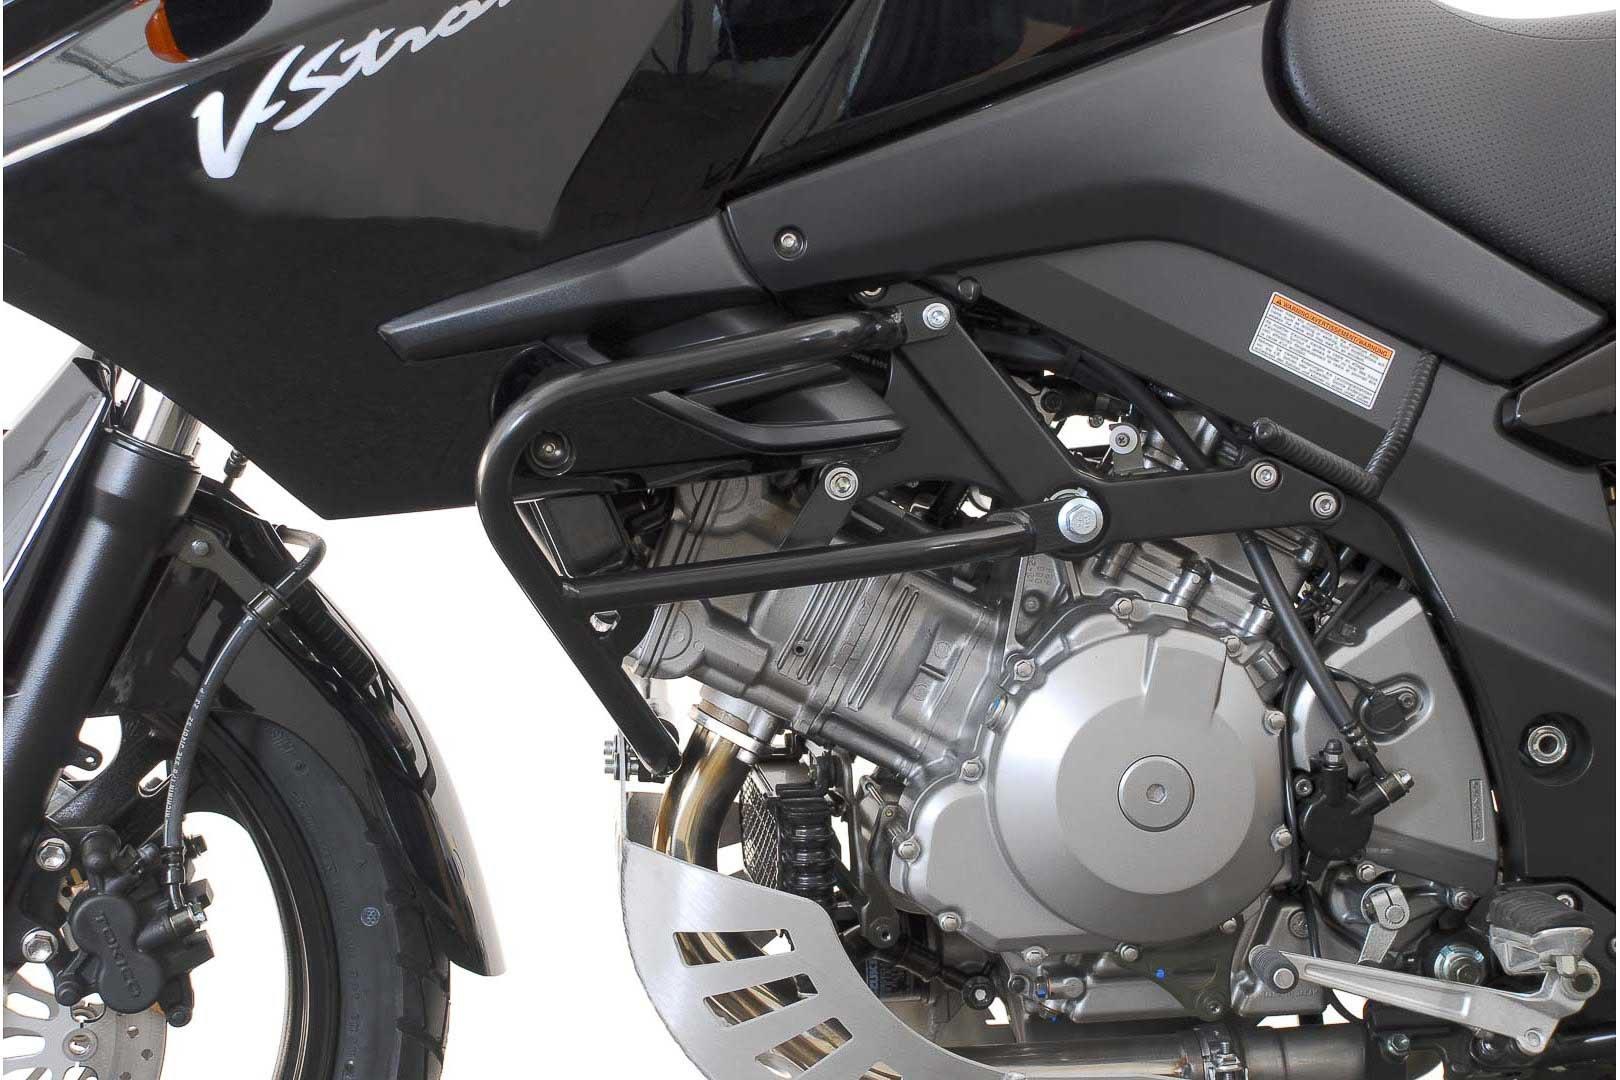 SW-Motech crash bar (black) Suzuki DL 1000 V-Strom / Kawasaki KLV 1000